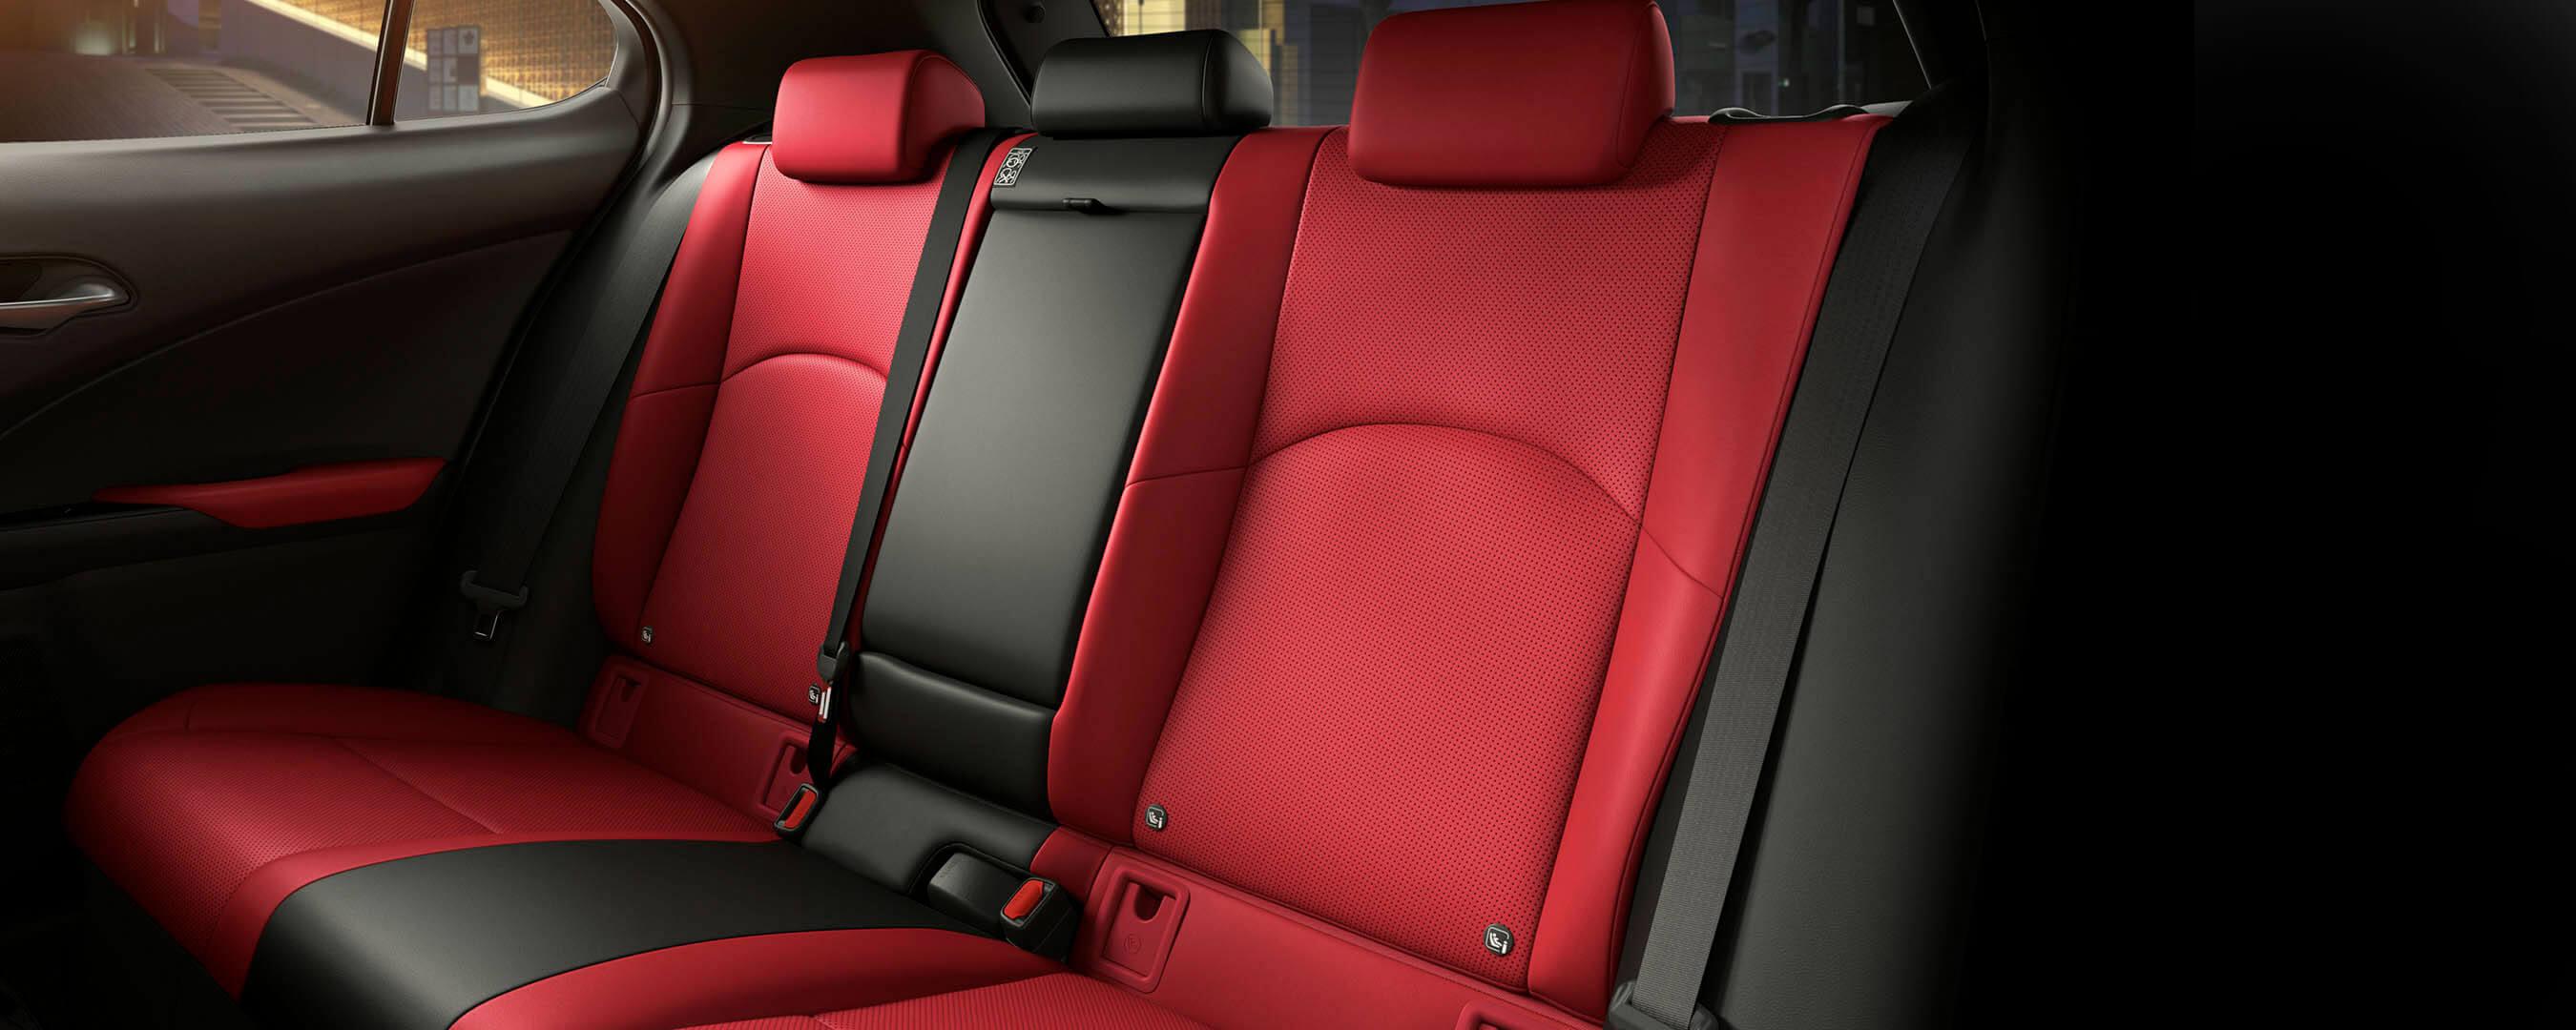 2018 lexus ux experience interior rear